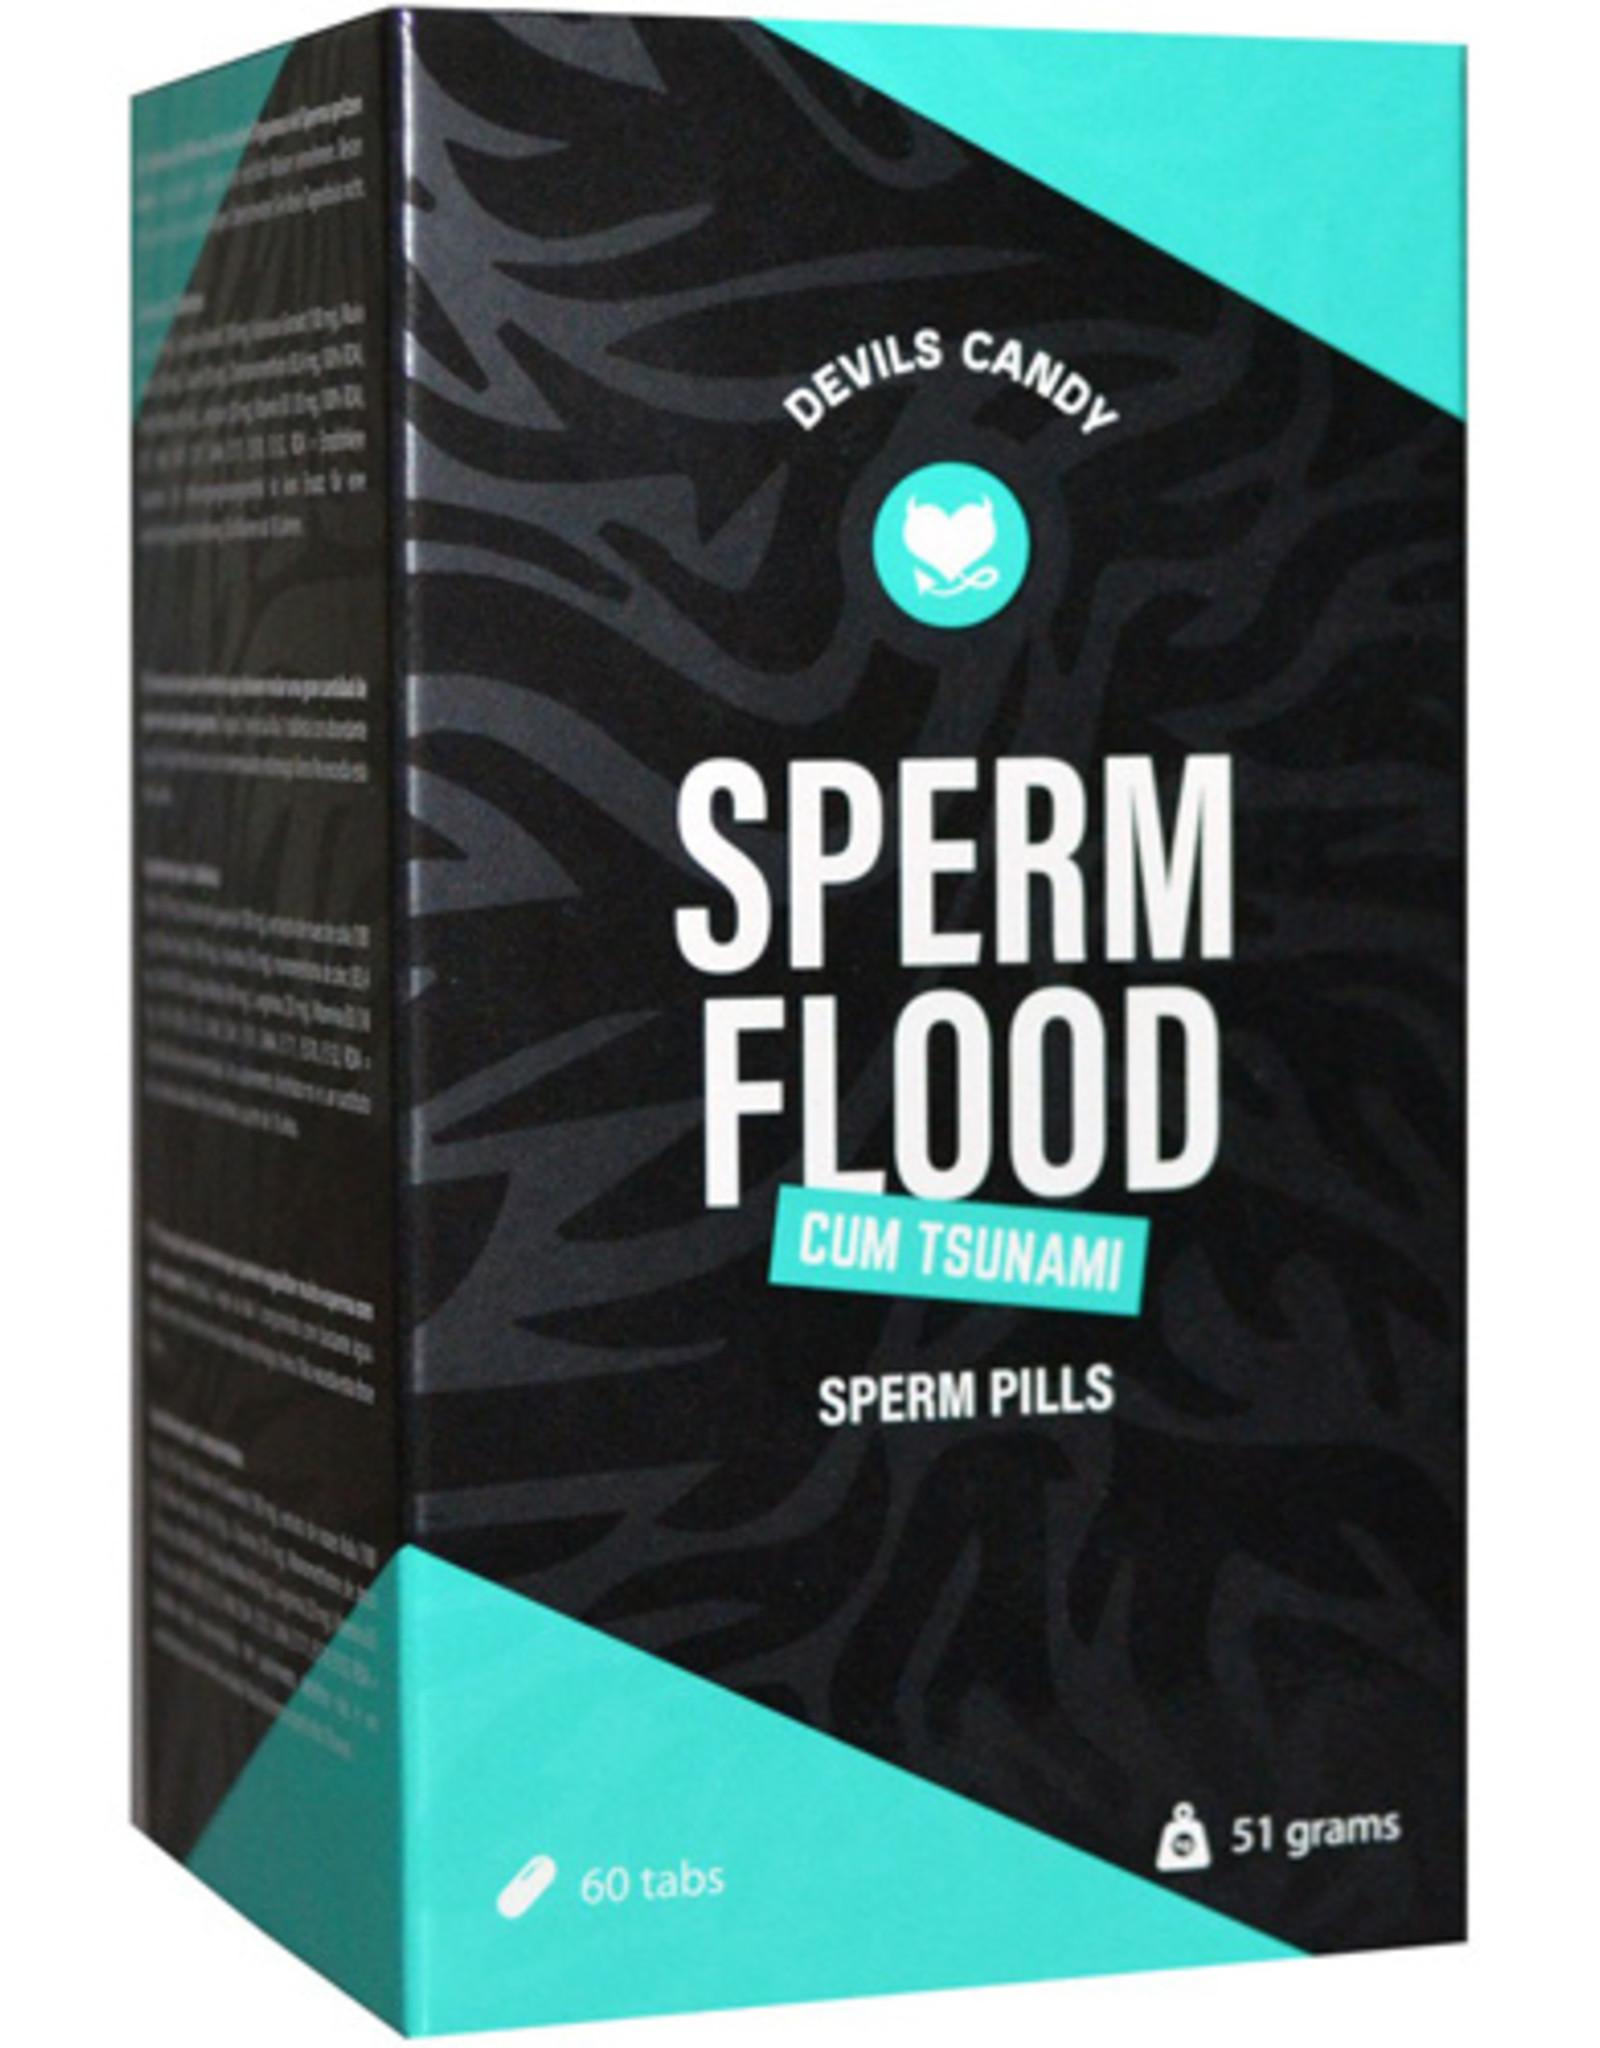 Morningstar Devils Candy Sperm Flood